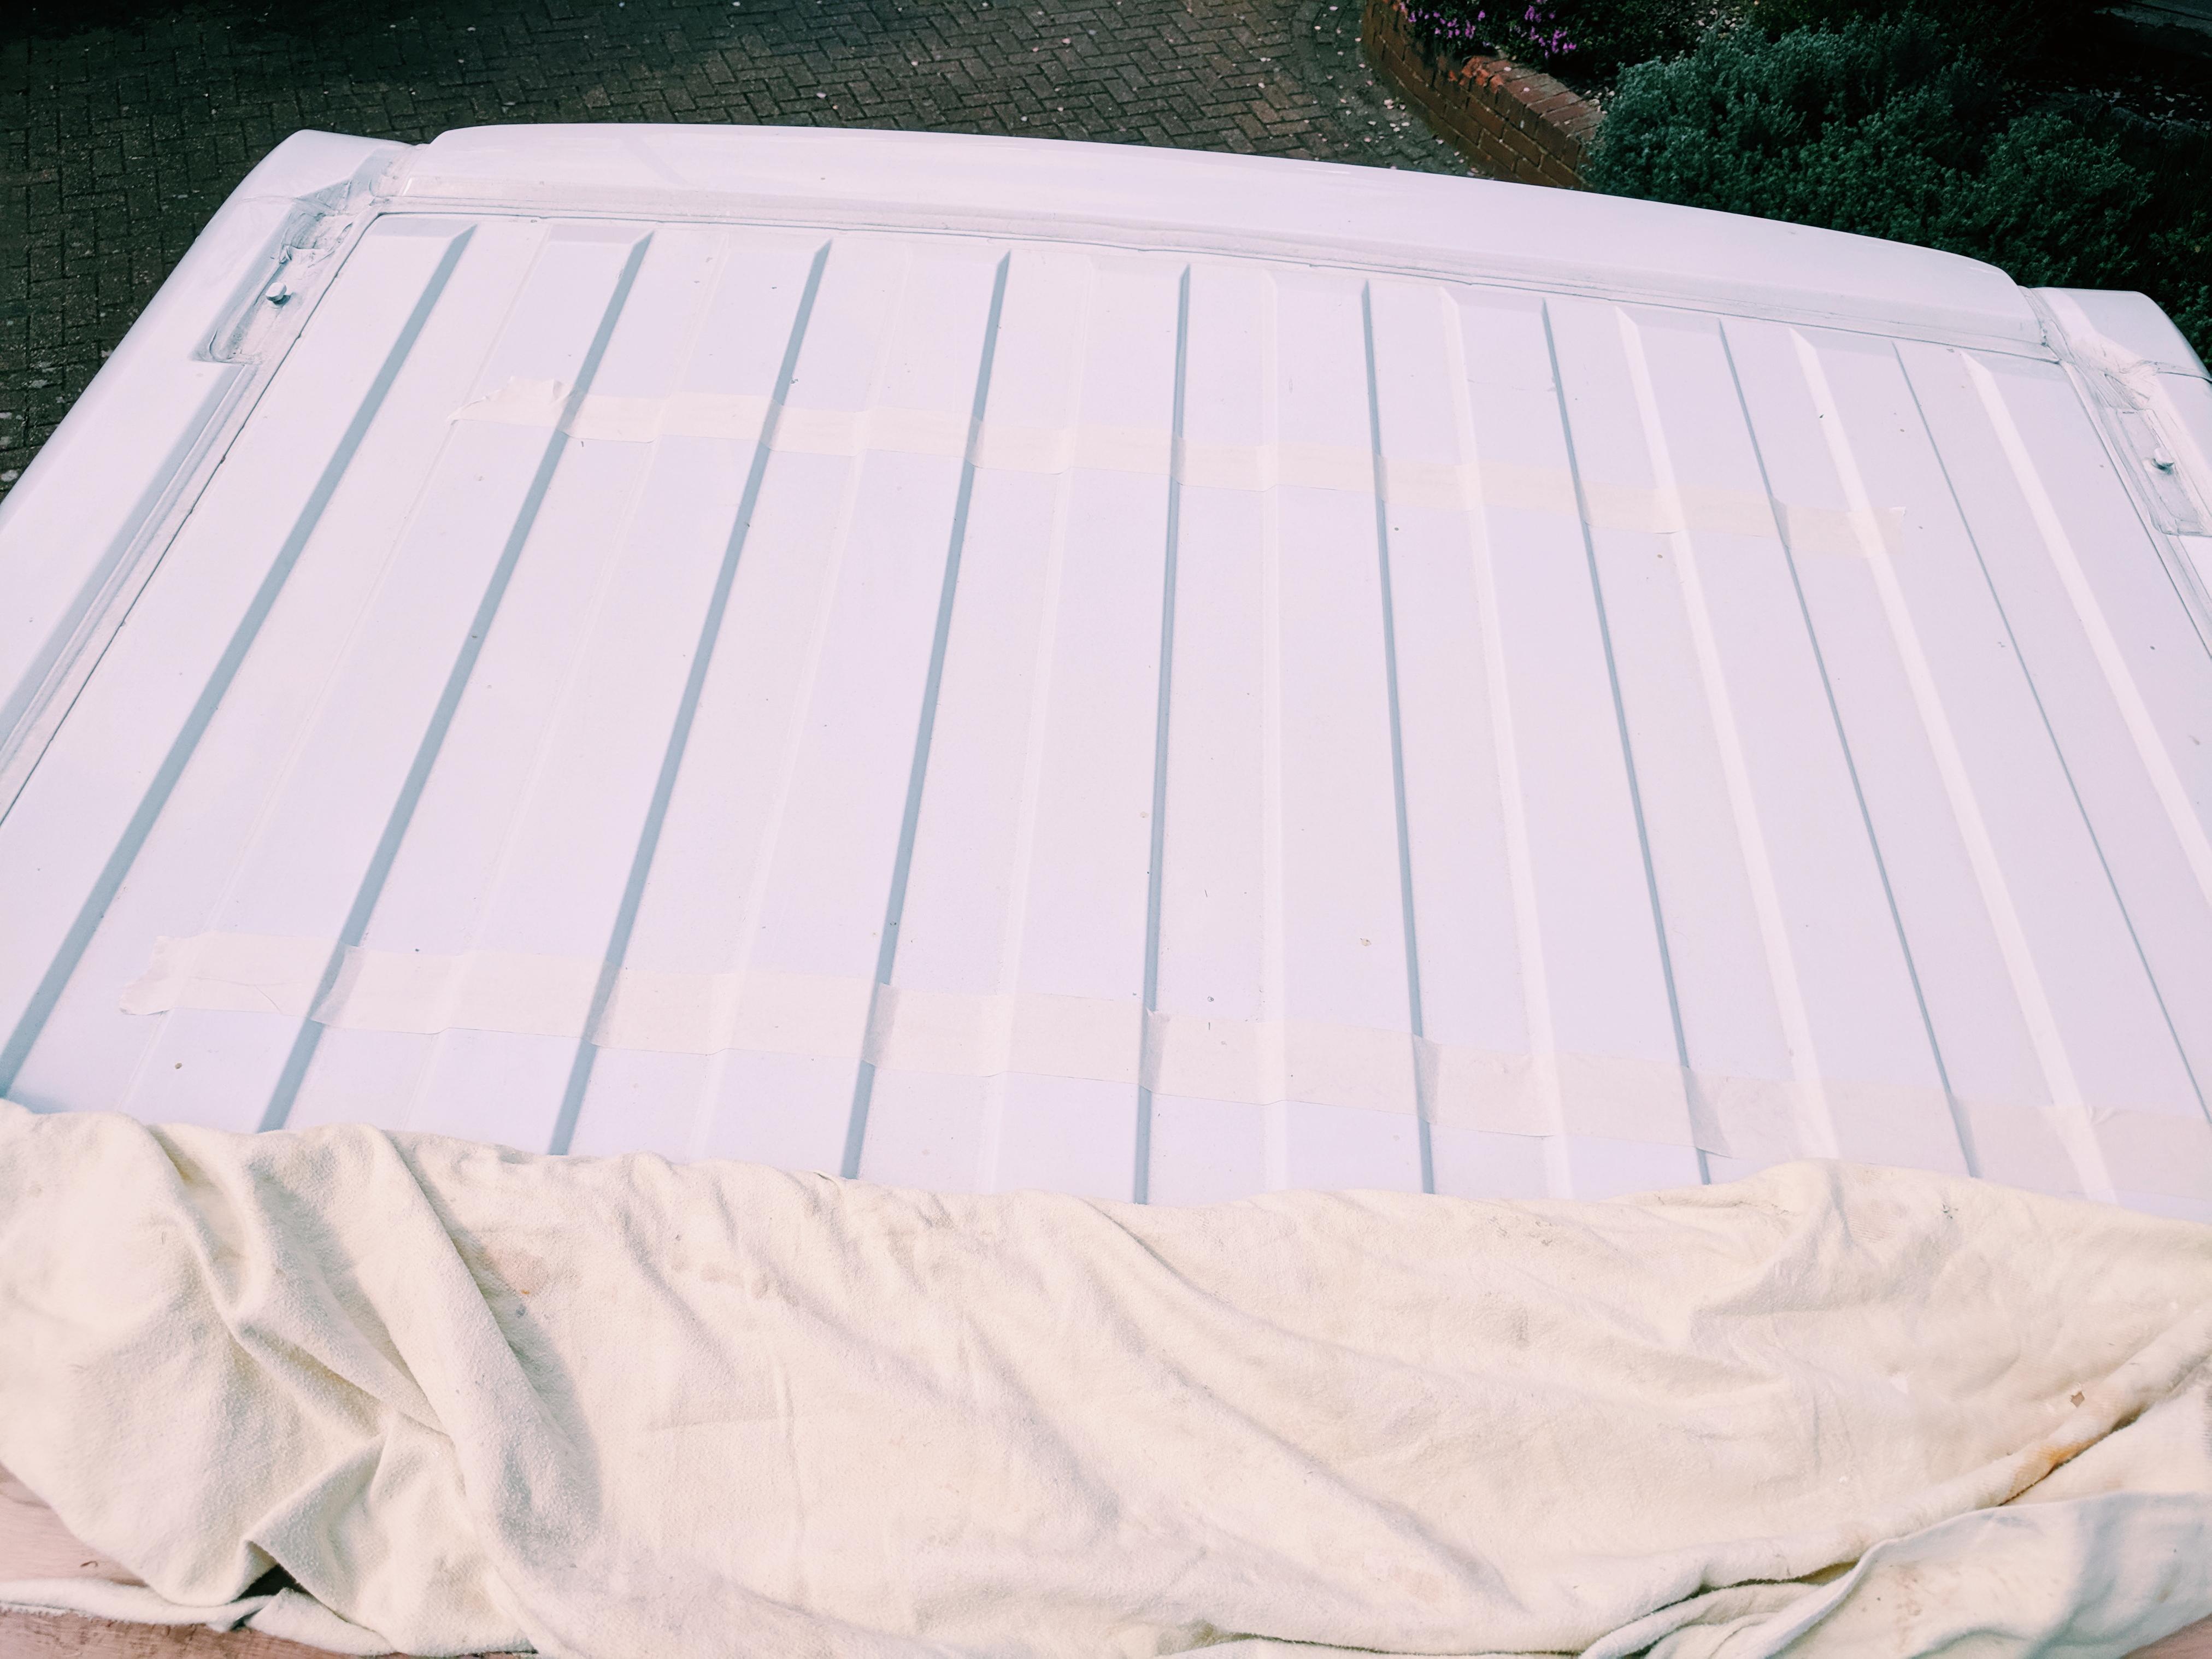 marking out heki midi rooflight with masking tape